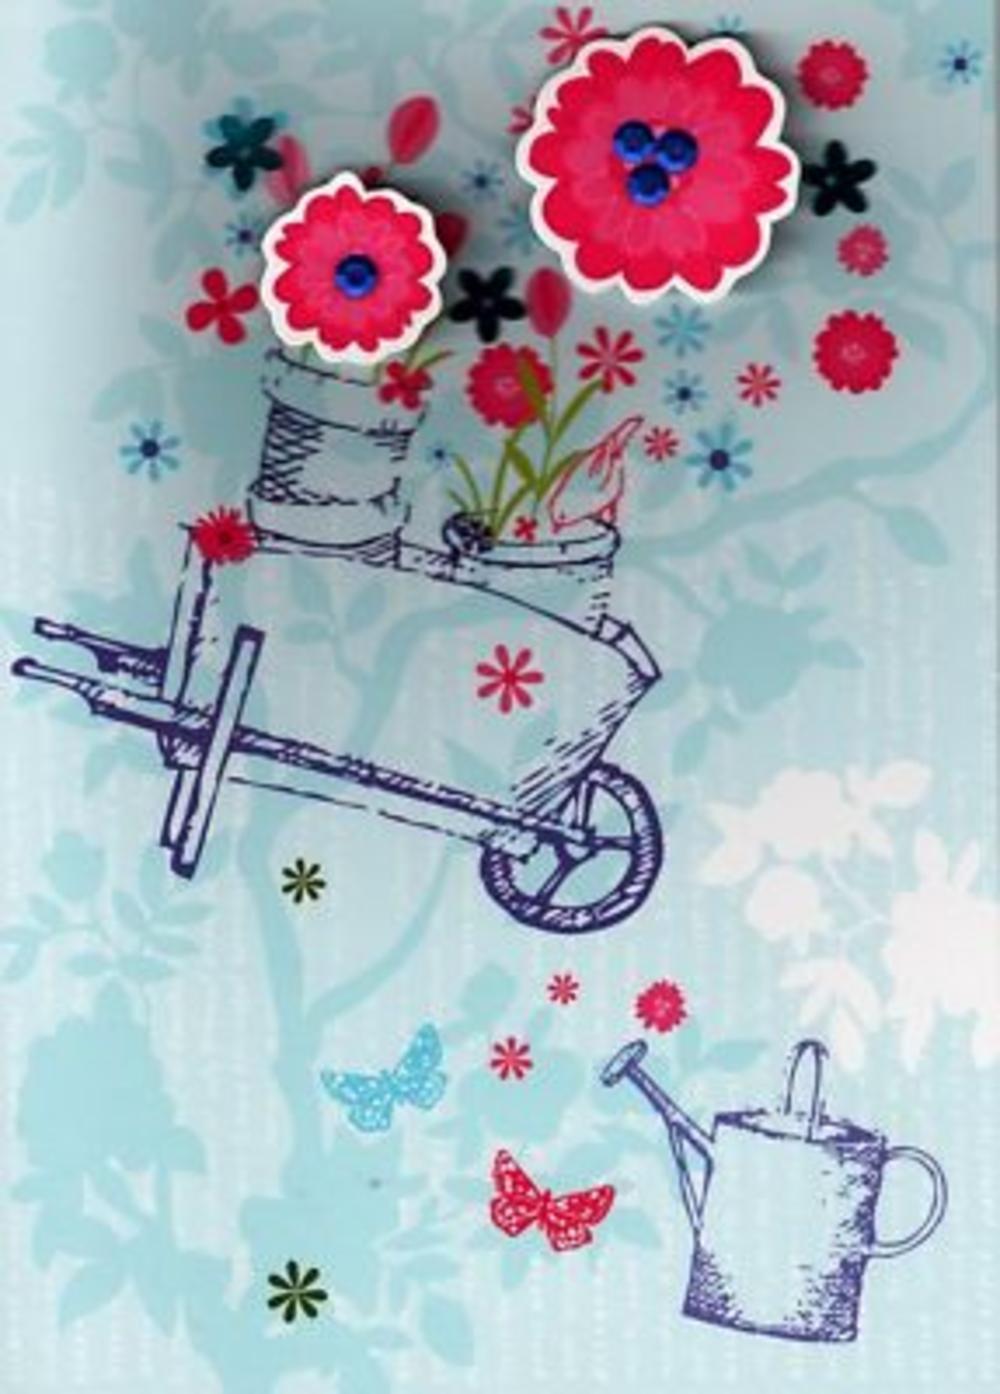 Luxury 3D Handcrafted Birthday Cards Gardening Card